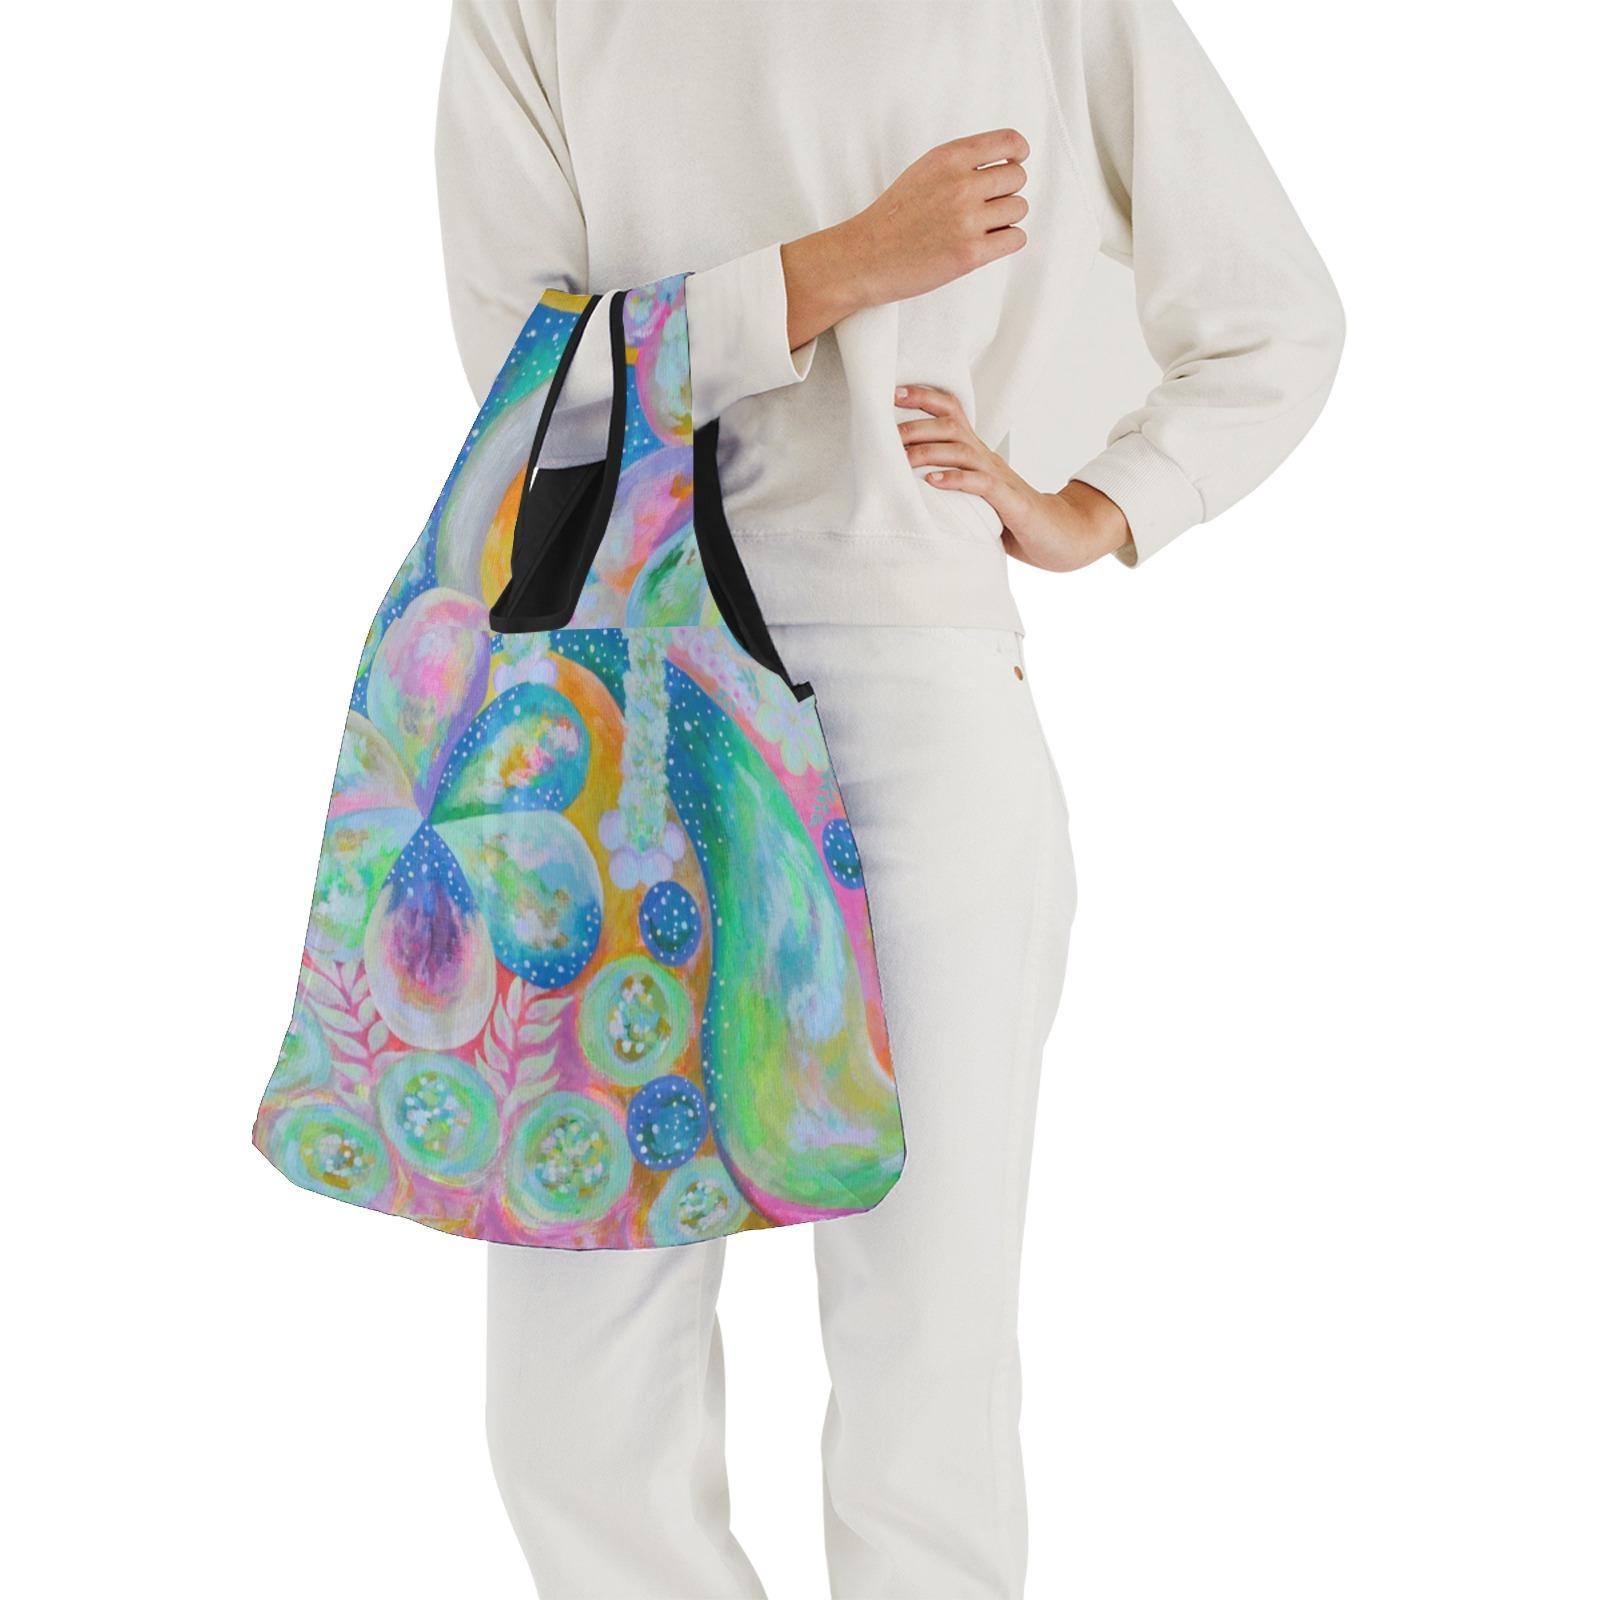 Pleiades Garden Foldable Reusable Grocery Bag (Model 1716)